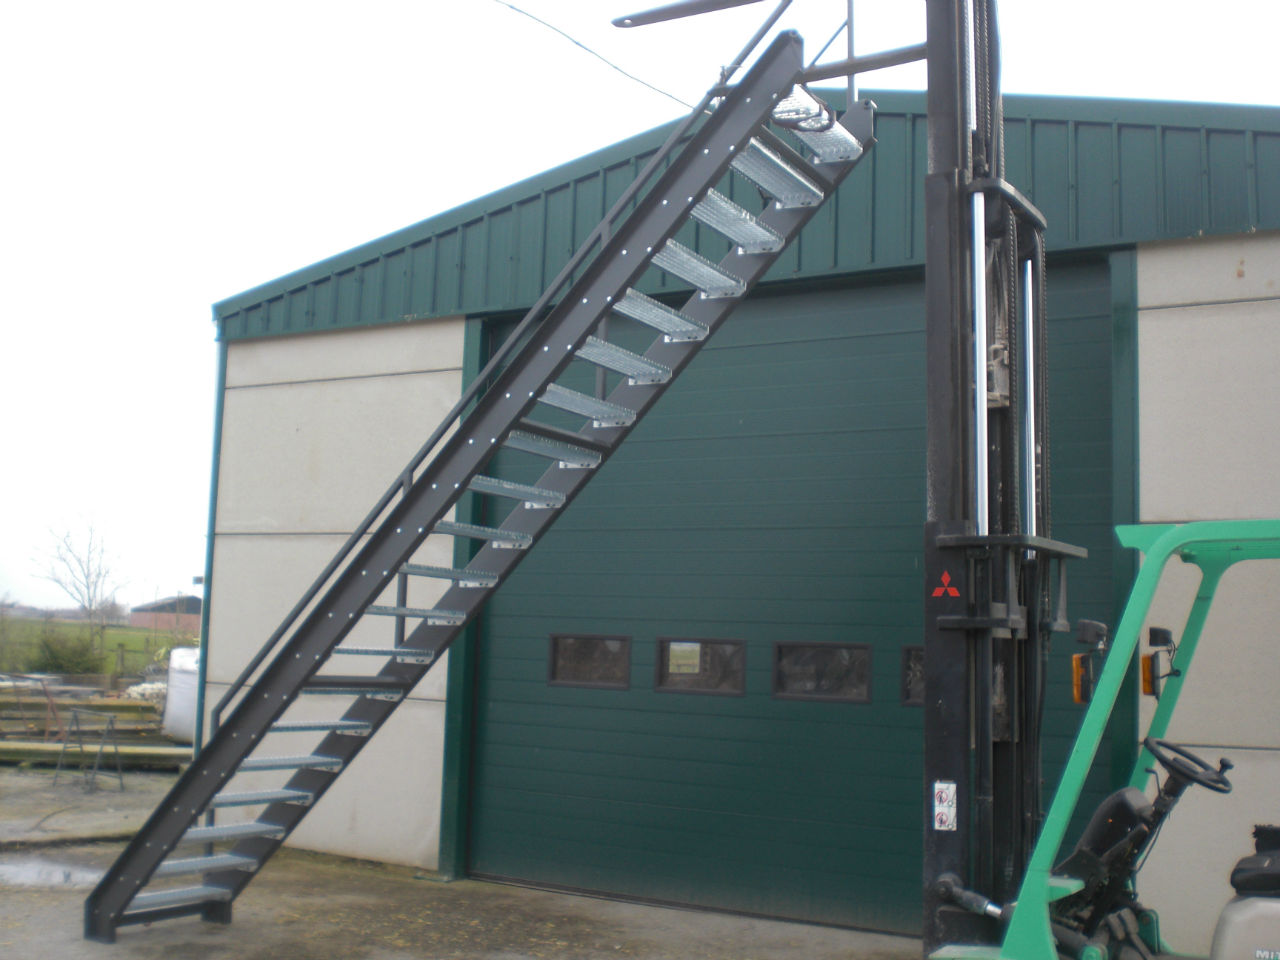 Industri le metalen trap stijn decroos for Metalen trap maken